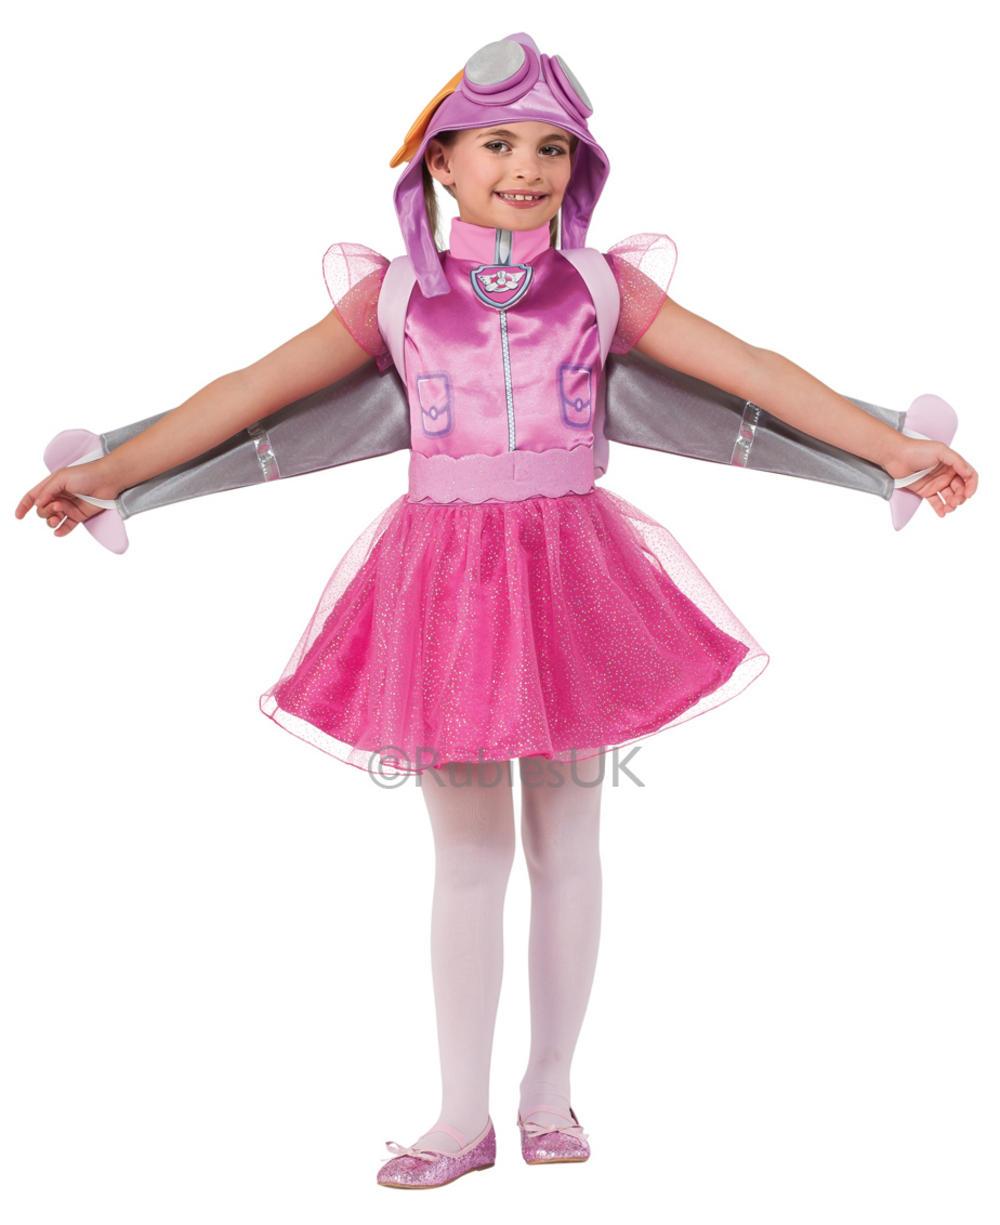 Paw Patrol Skye Girls Fancy Dress Costume